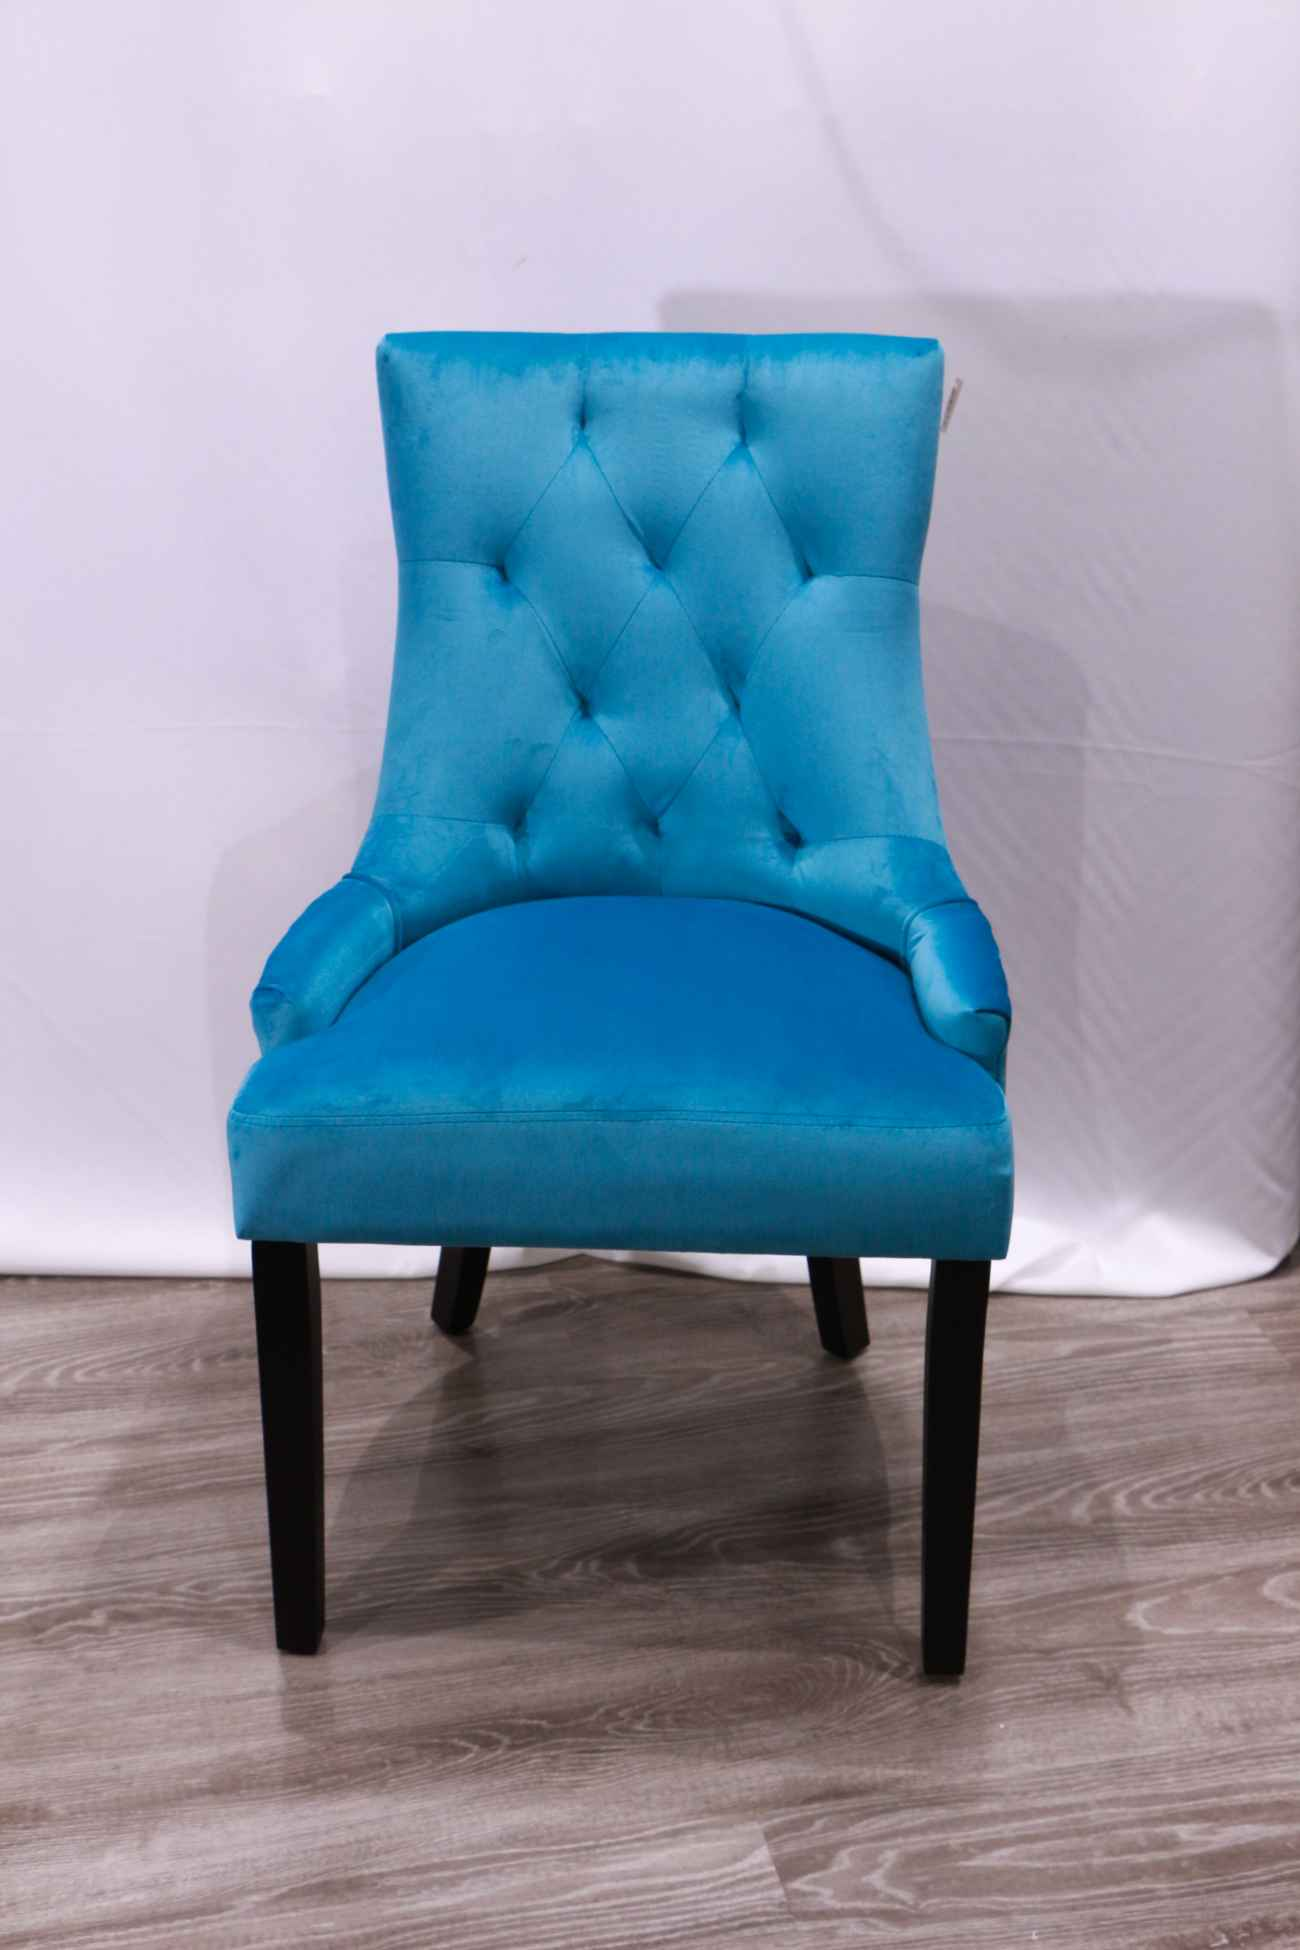 Coppia sedie in velluto - Stilfiore